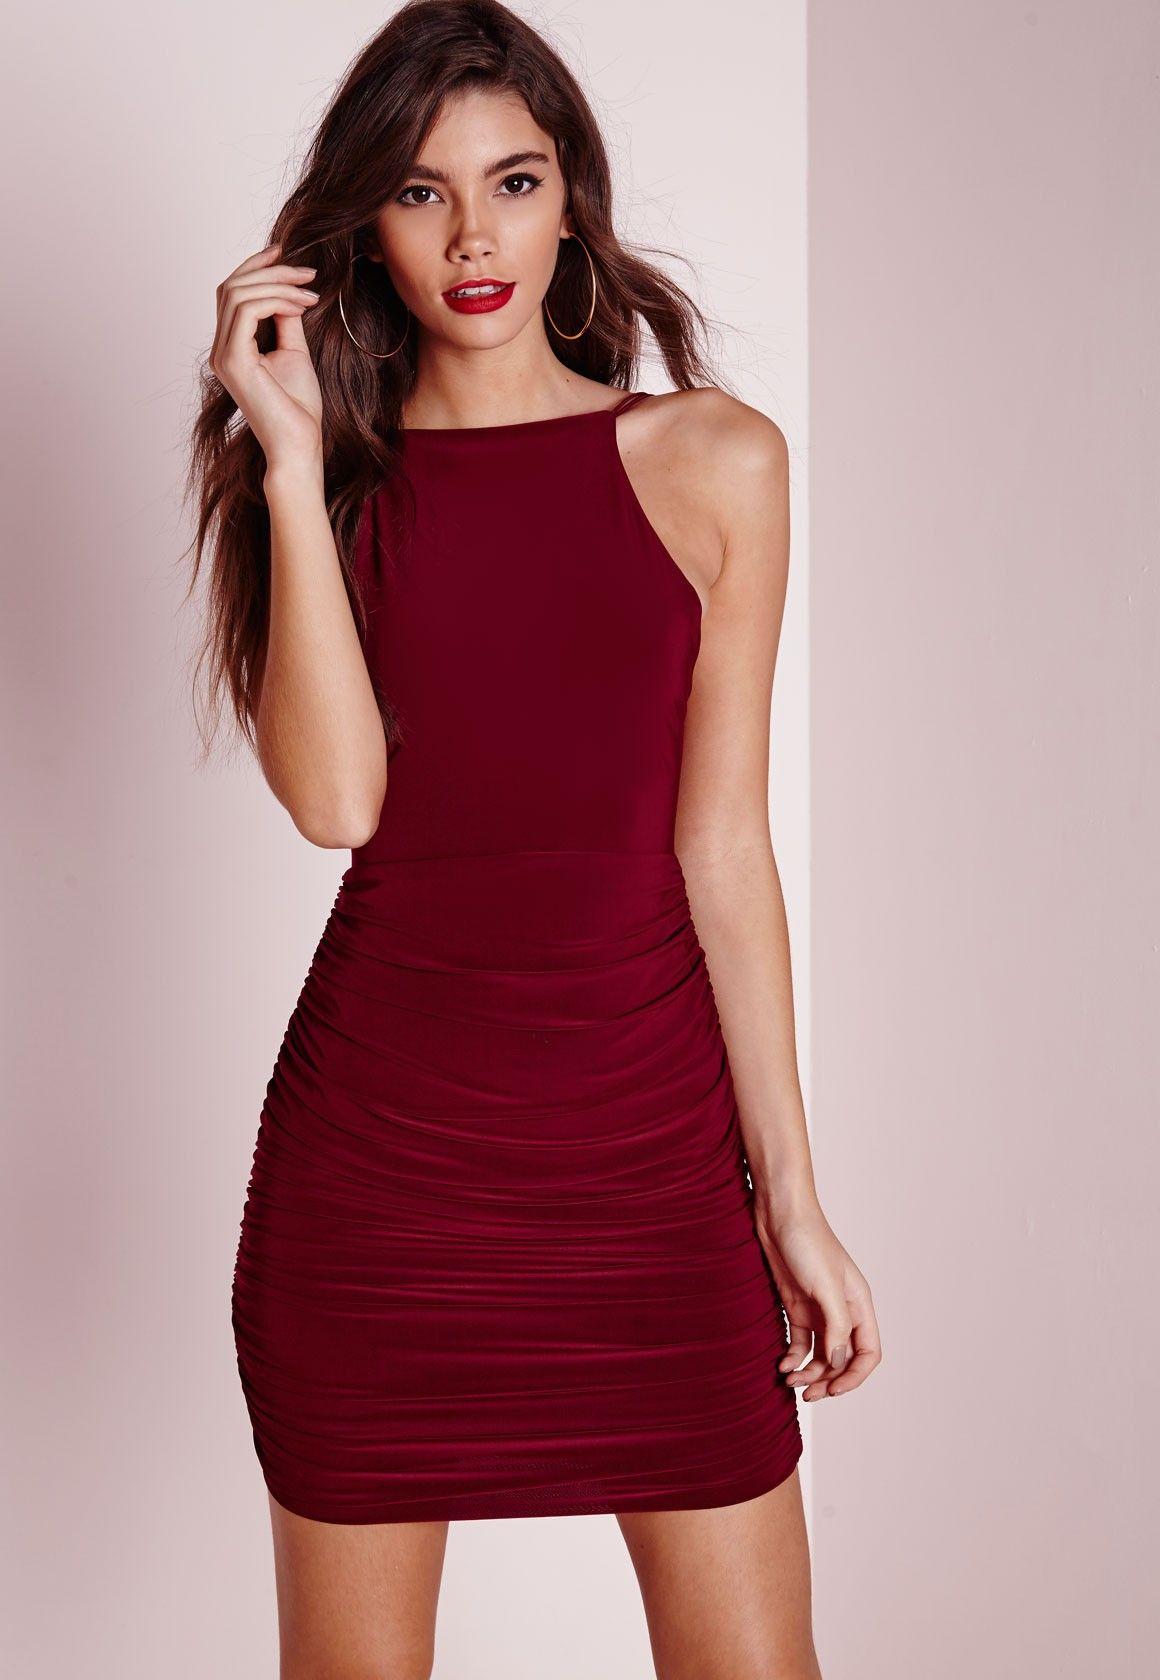 d245bcbf332 Missguided - Slinky High Neck Bodycon Dress Burgundy